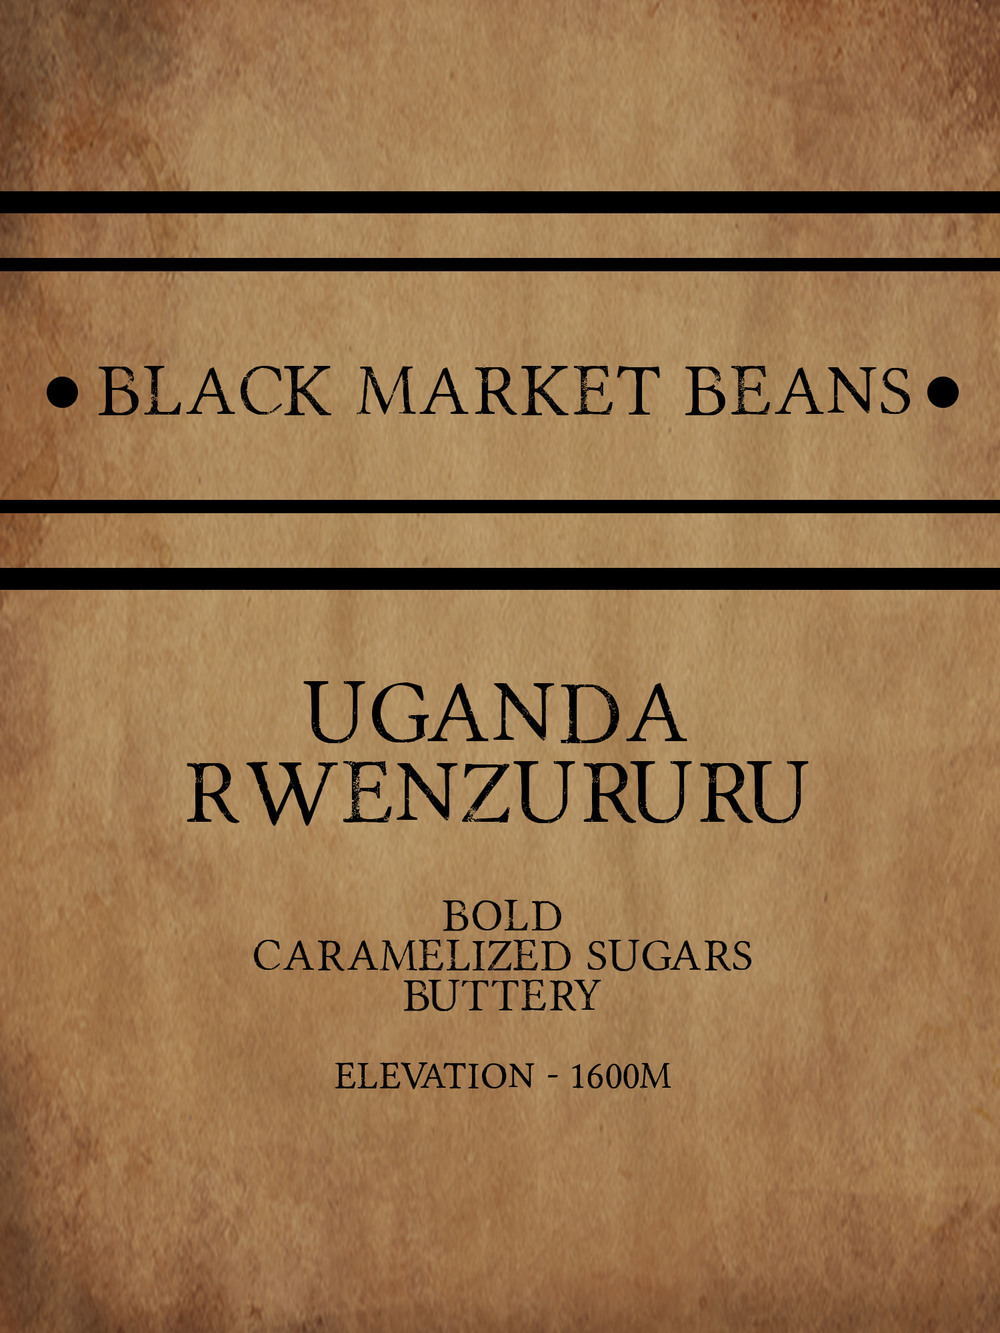 coffee_Uganda_rwenzururu.jpg